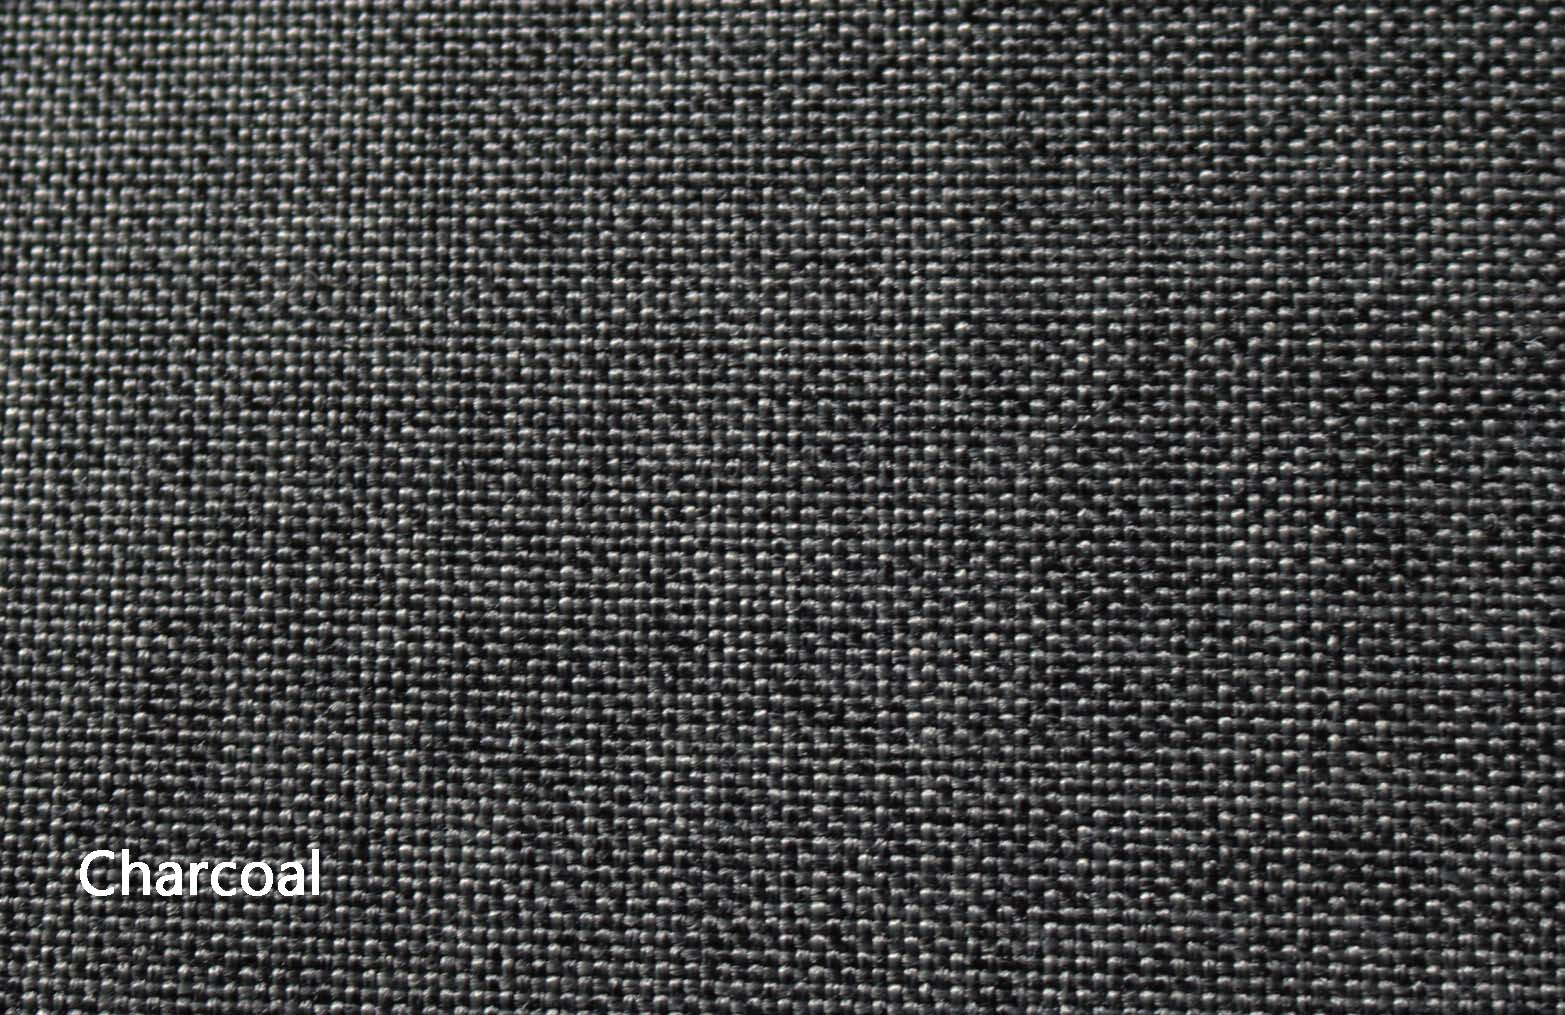 fabric charcoal.jpg